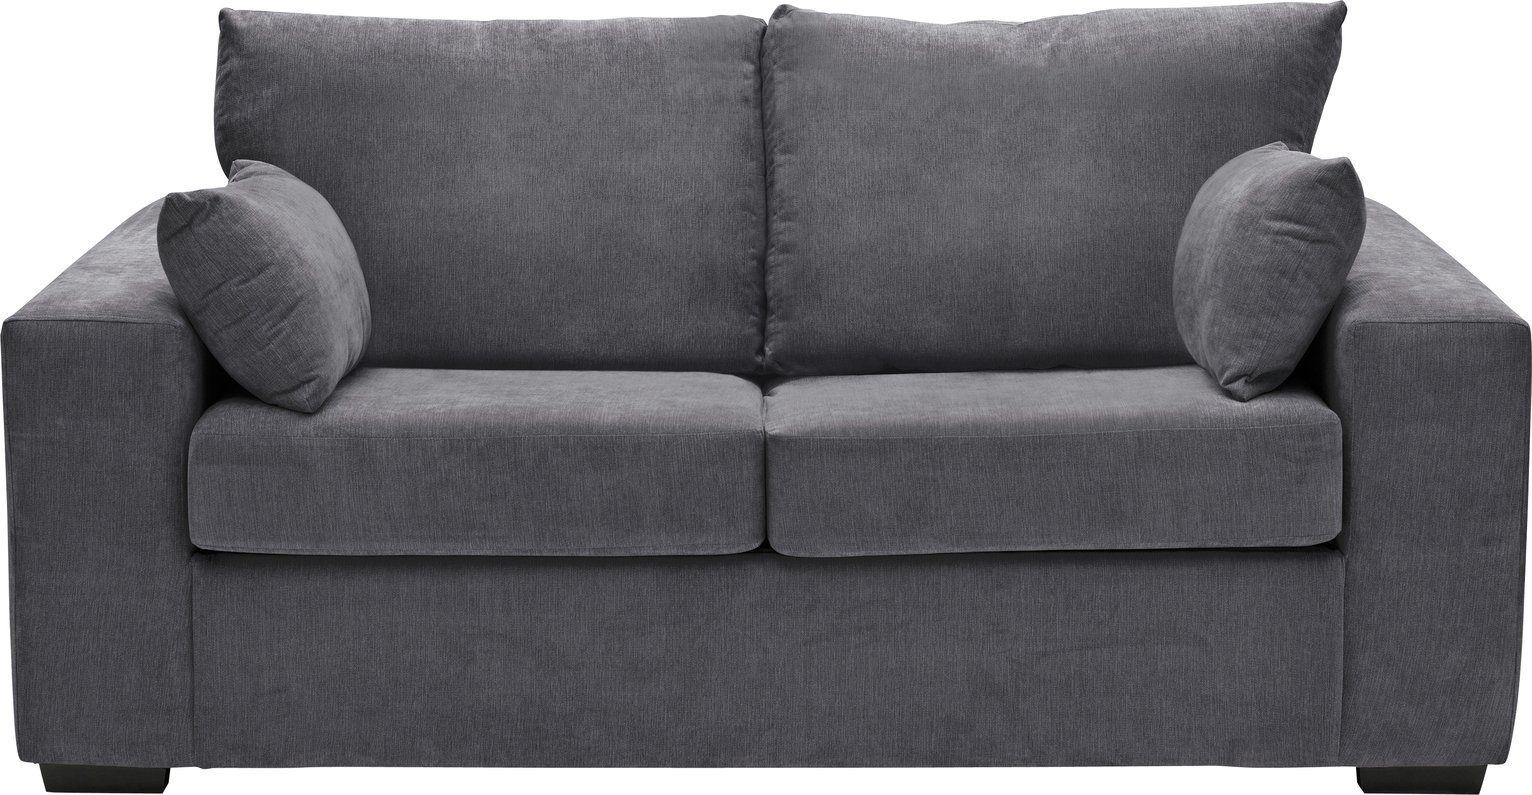 Buy Argos Home Eton 2 Seater Fabric Sofa Bed Charcoal Sofa